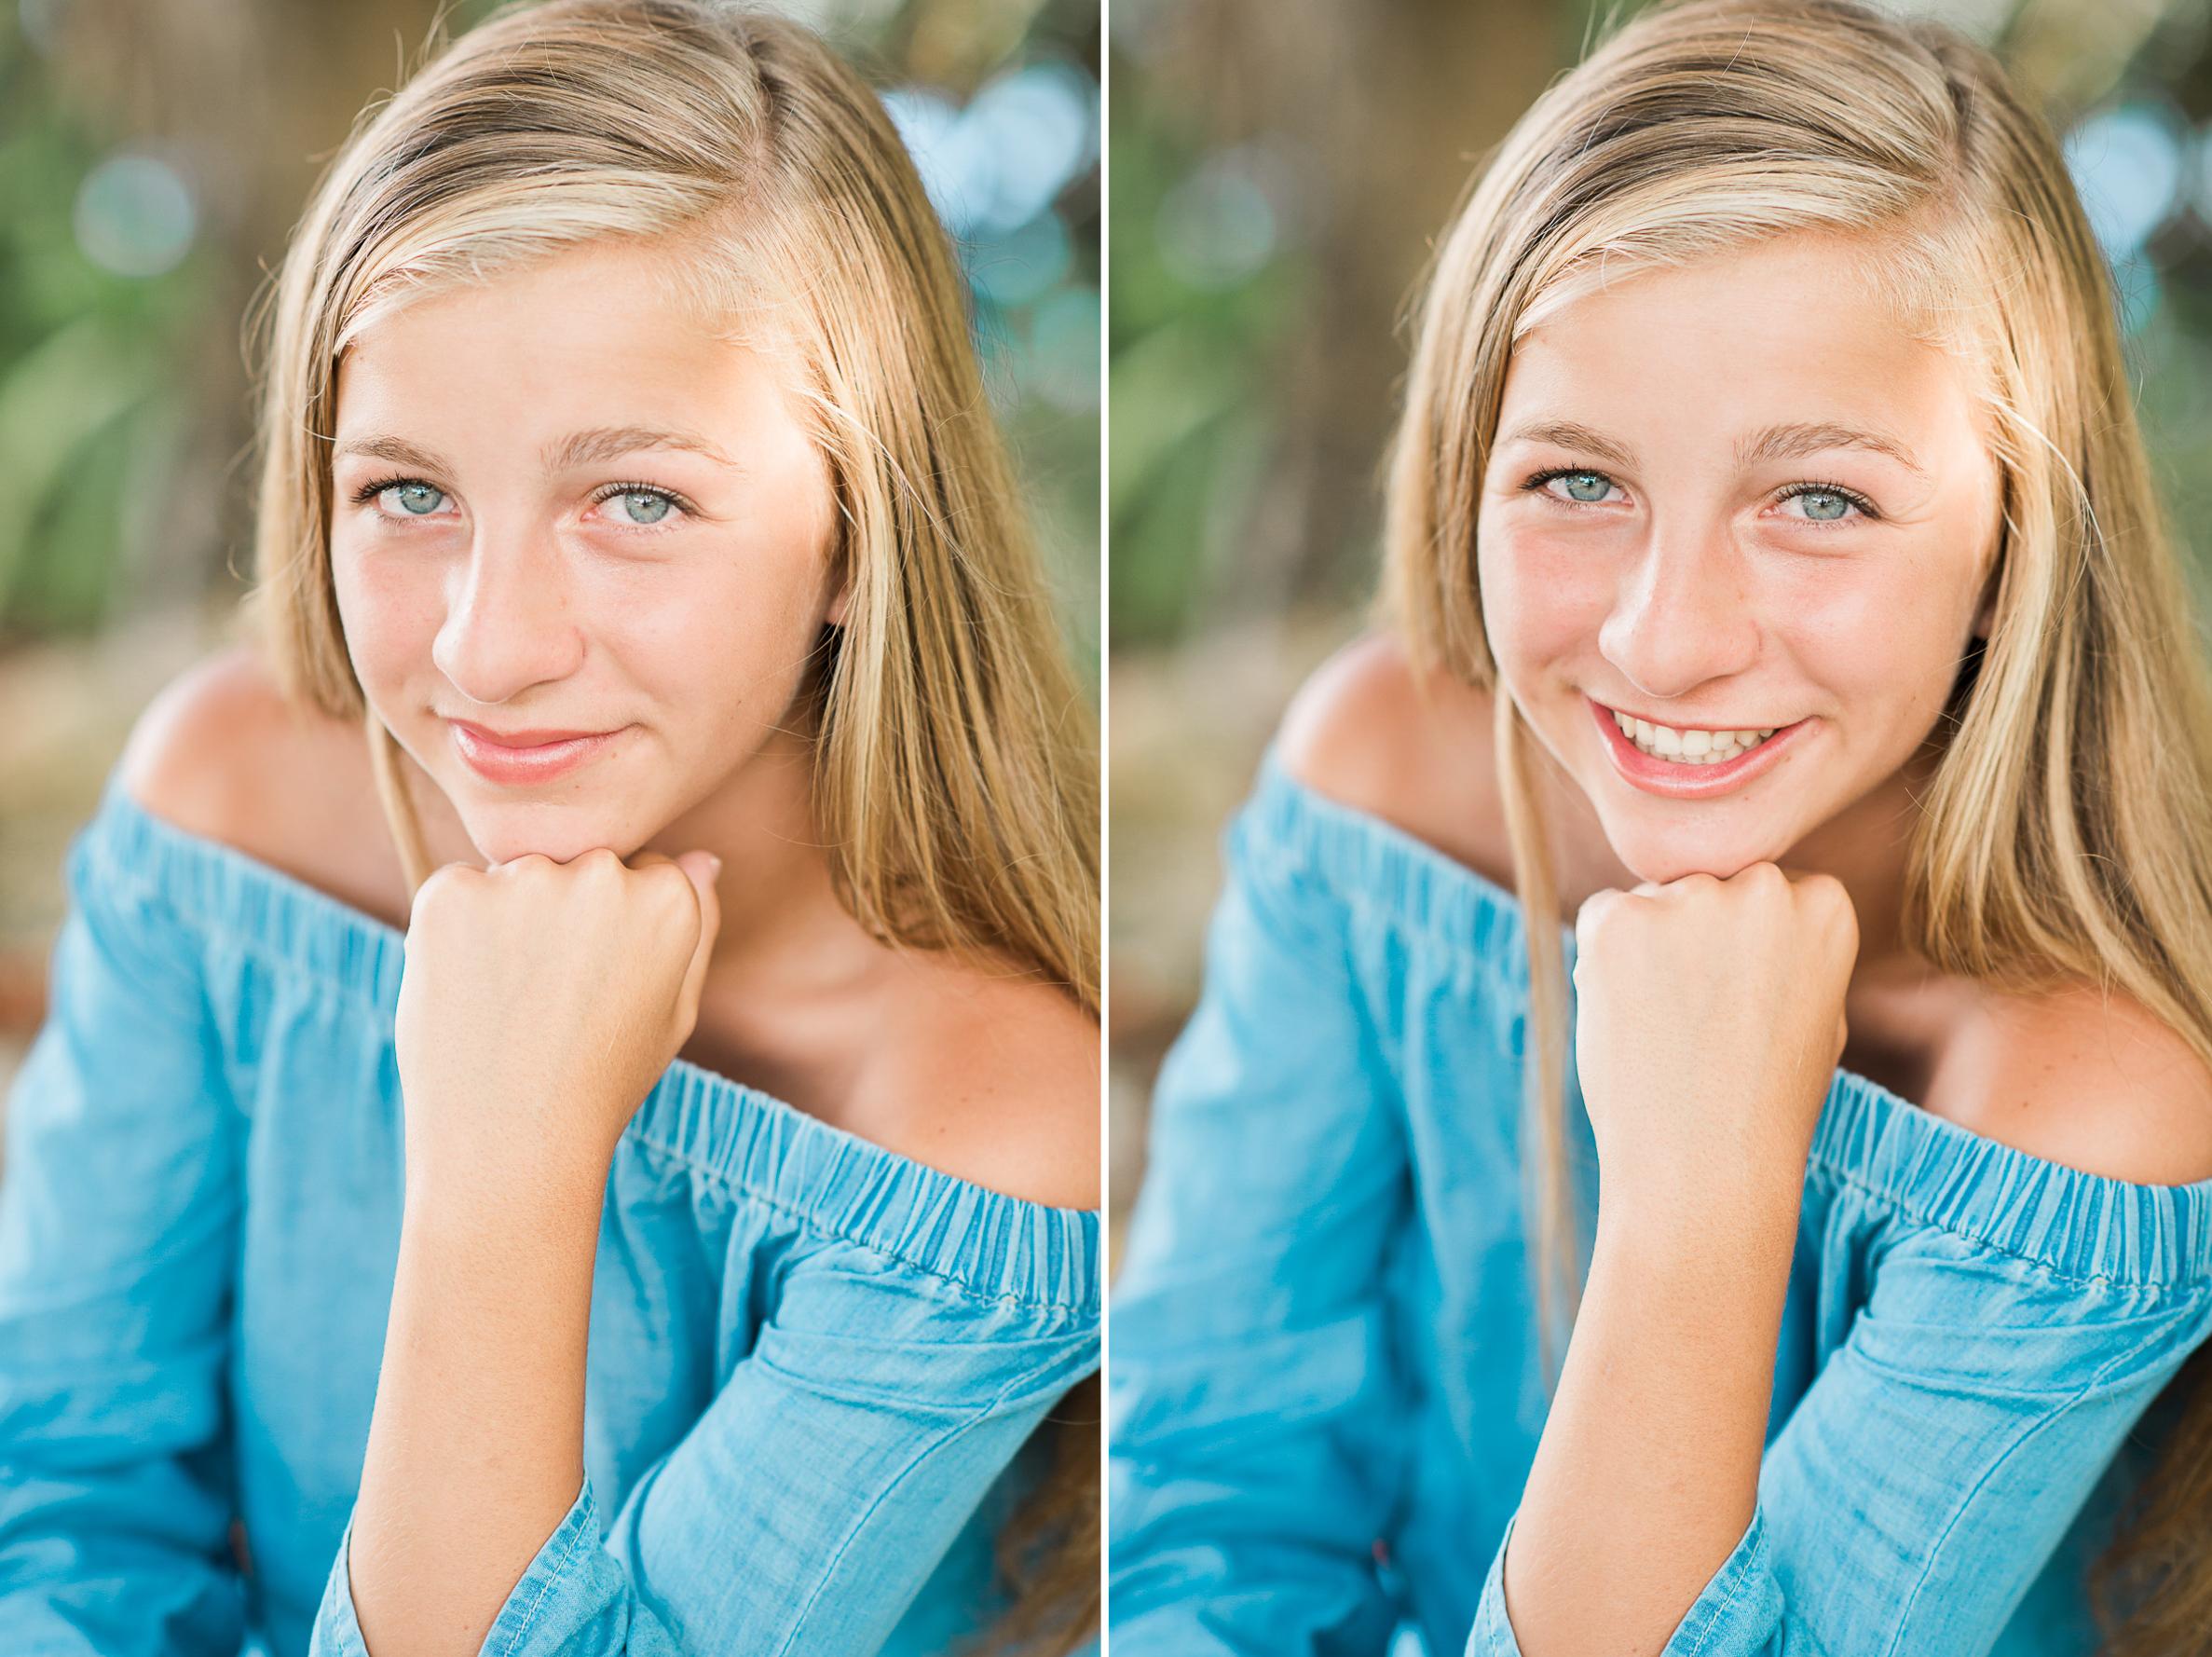 KateTaramykinStudios-West-Palm-Beach-Senior-Portraits-Katie-18.jpg